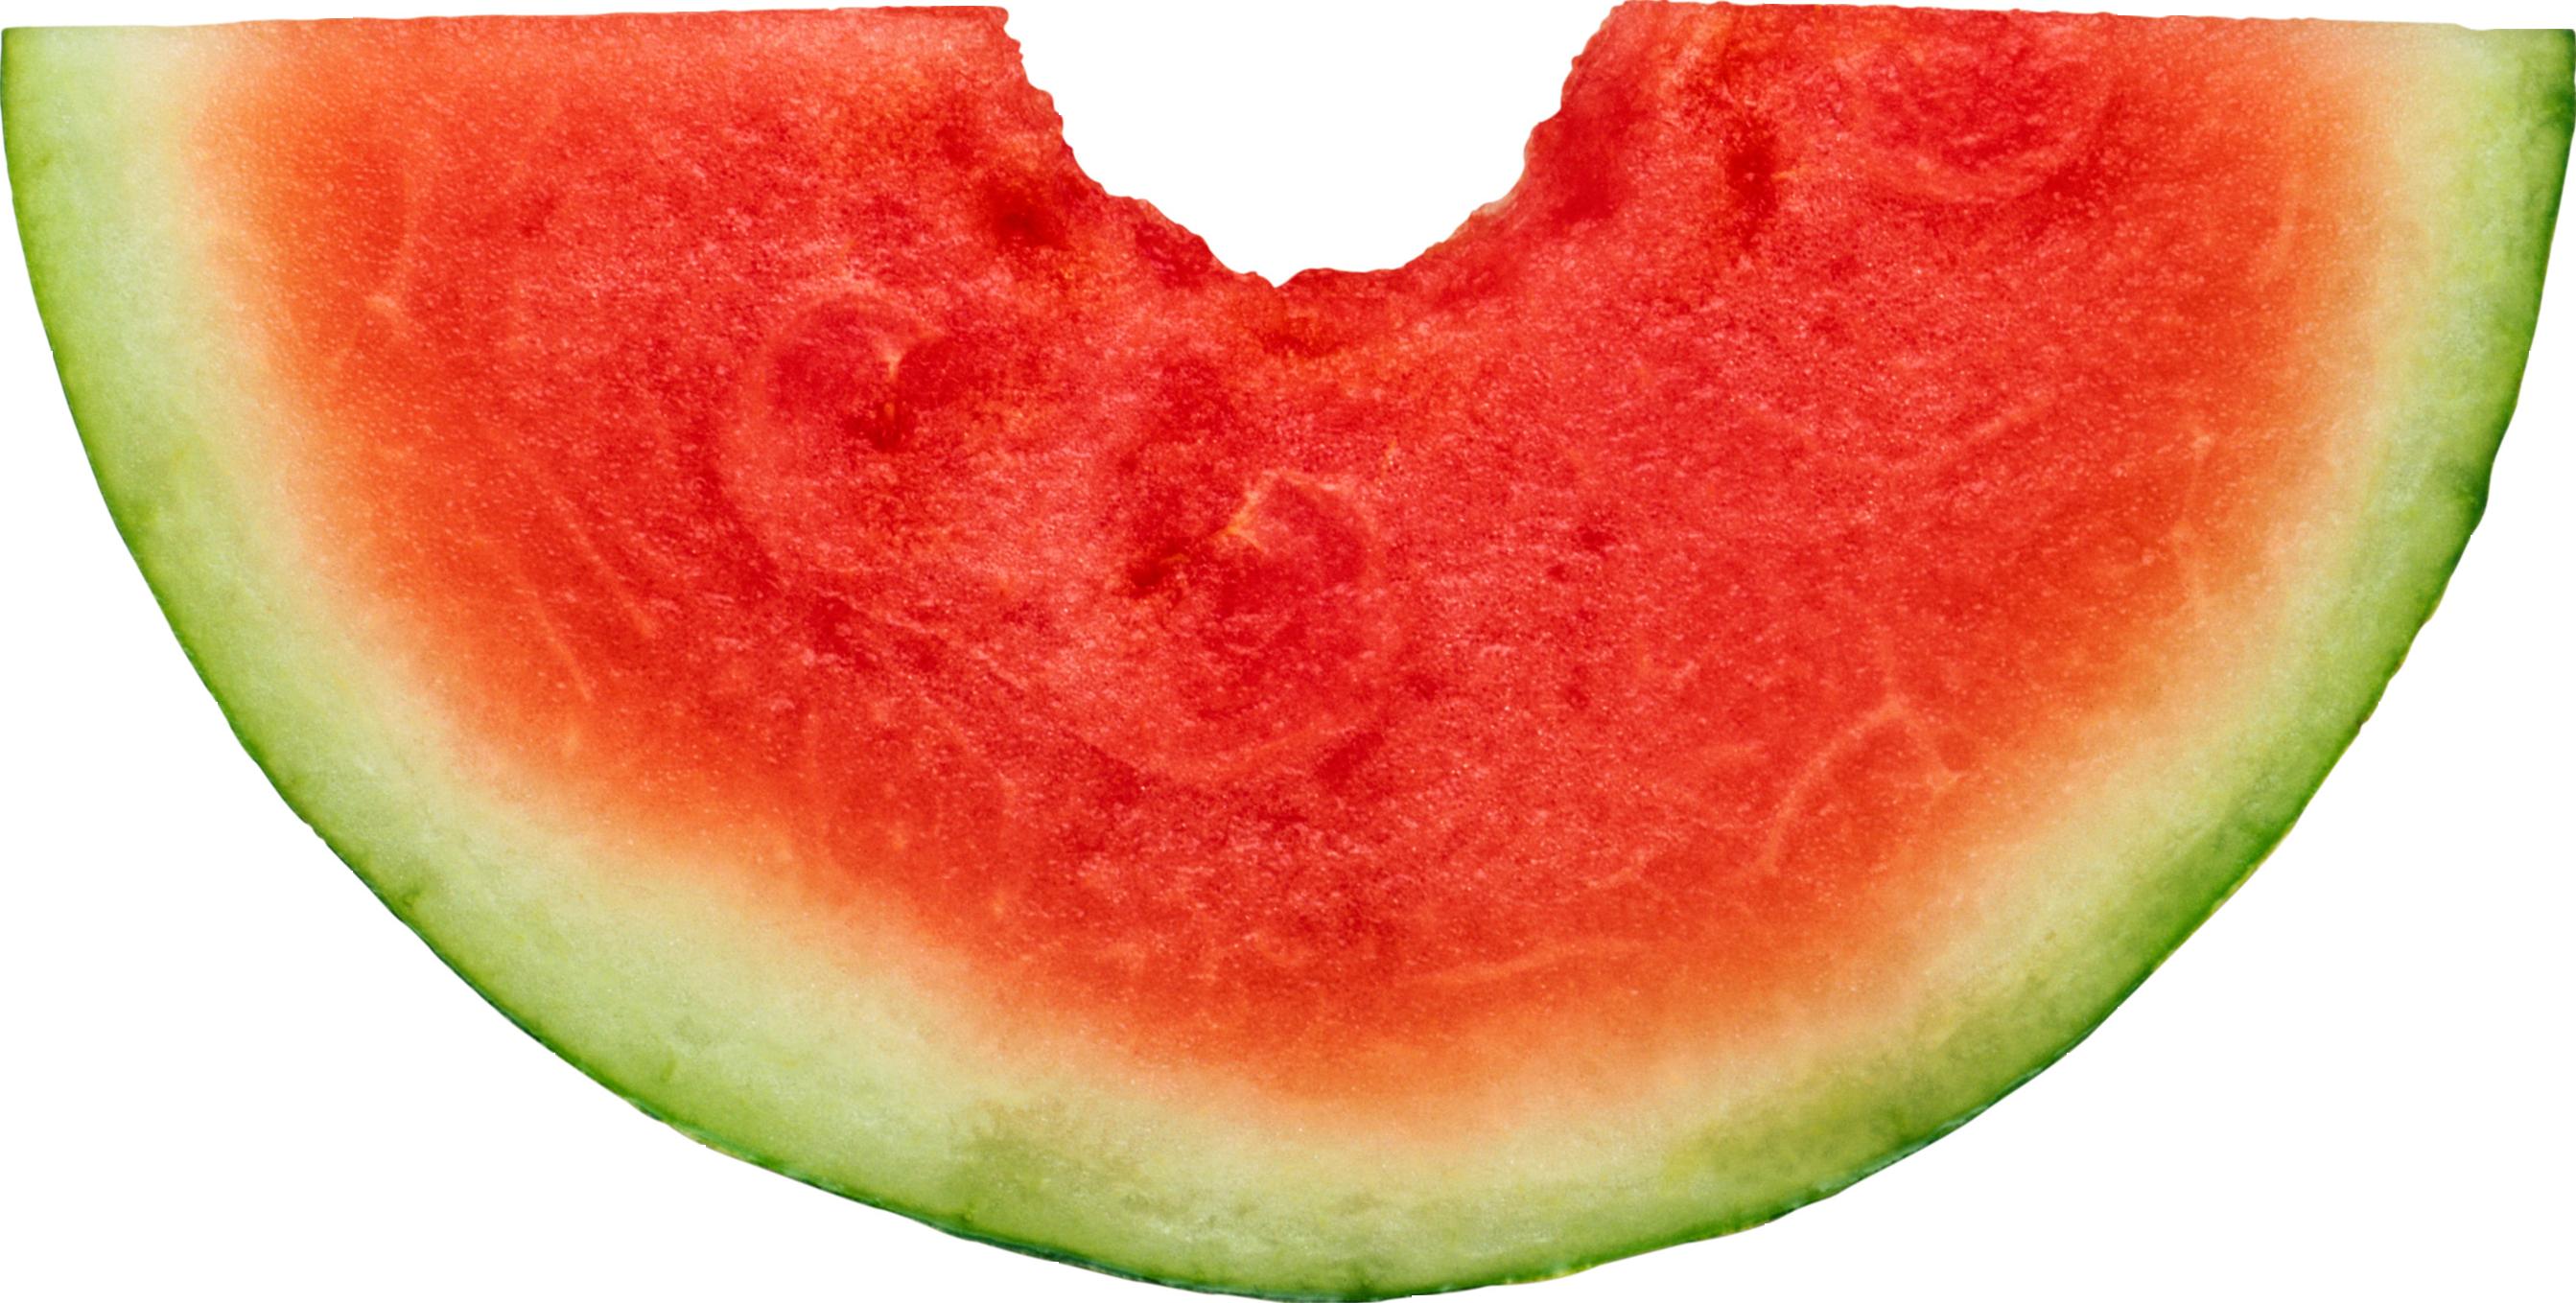 Watermelon HD PNG - 118687